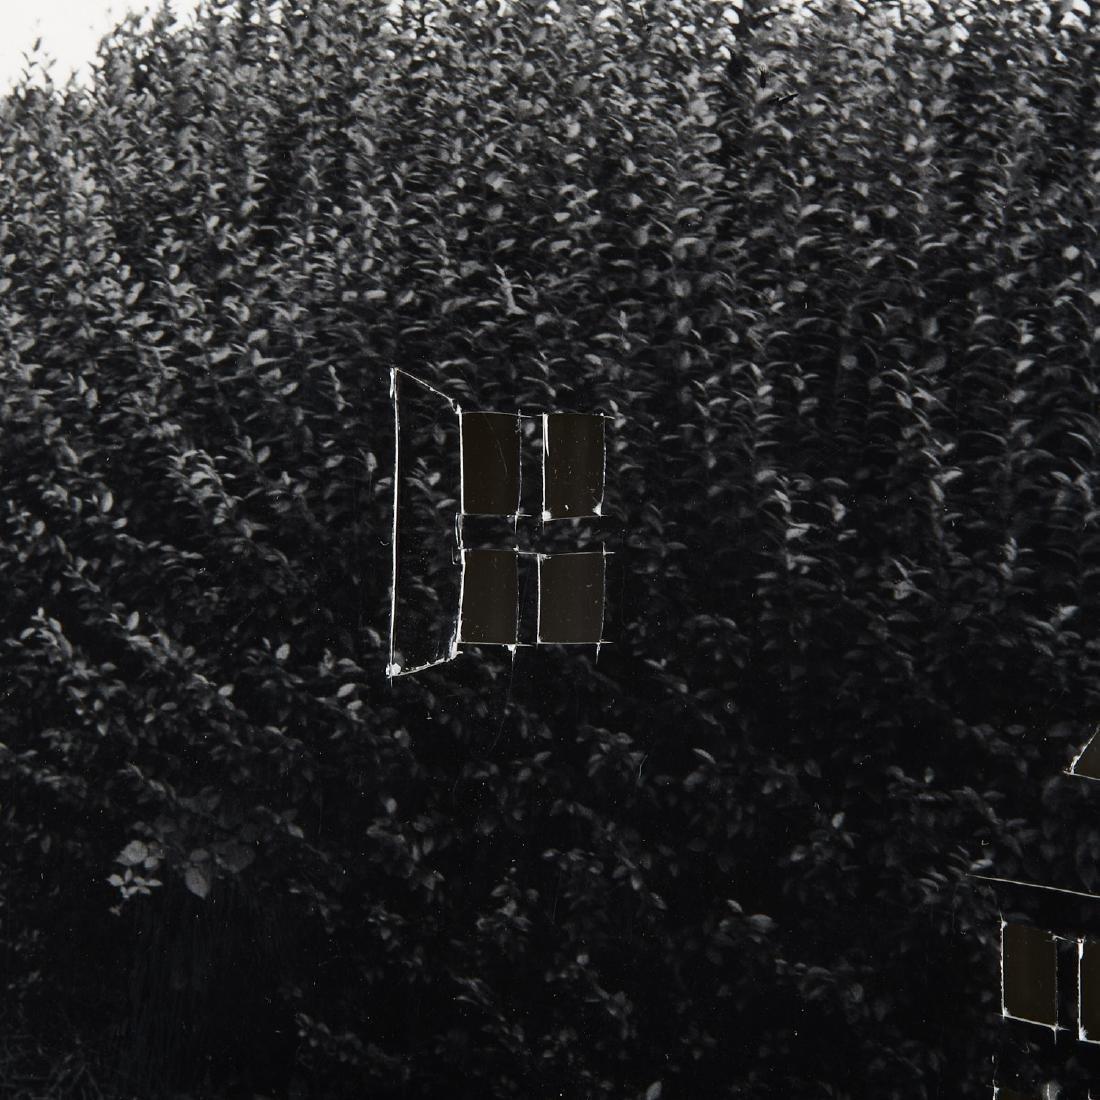 William Wegman, photograph - 3